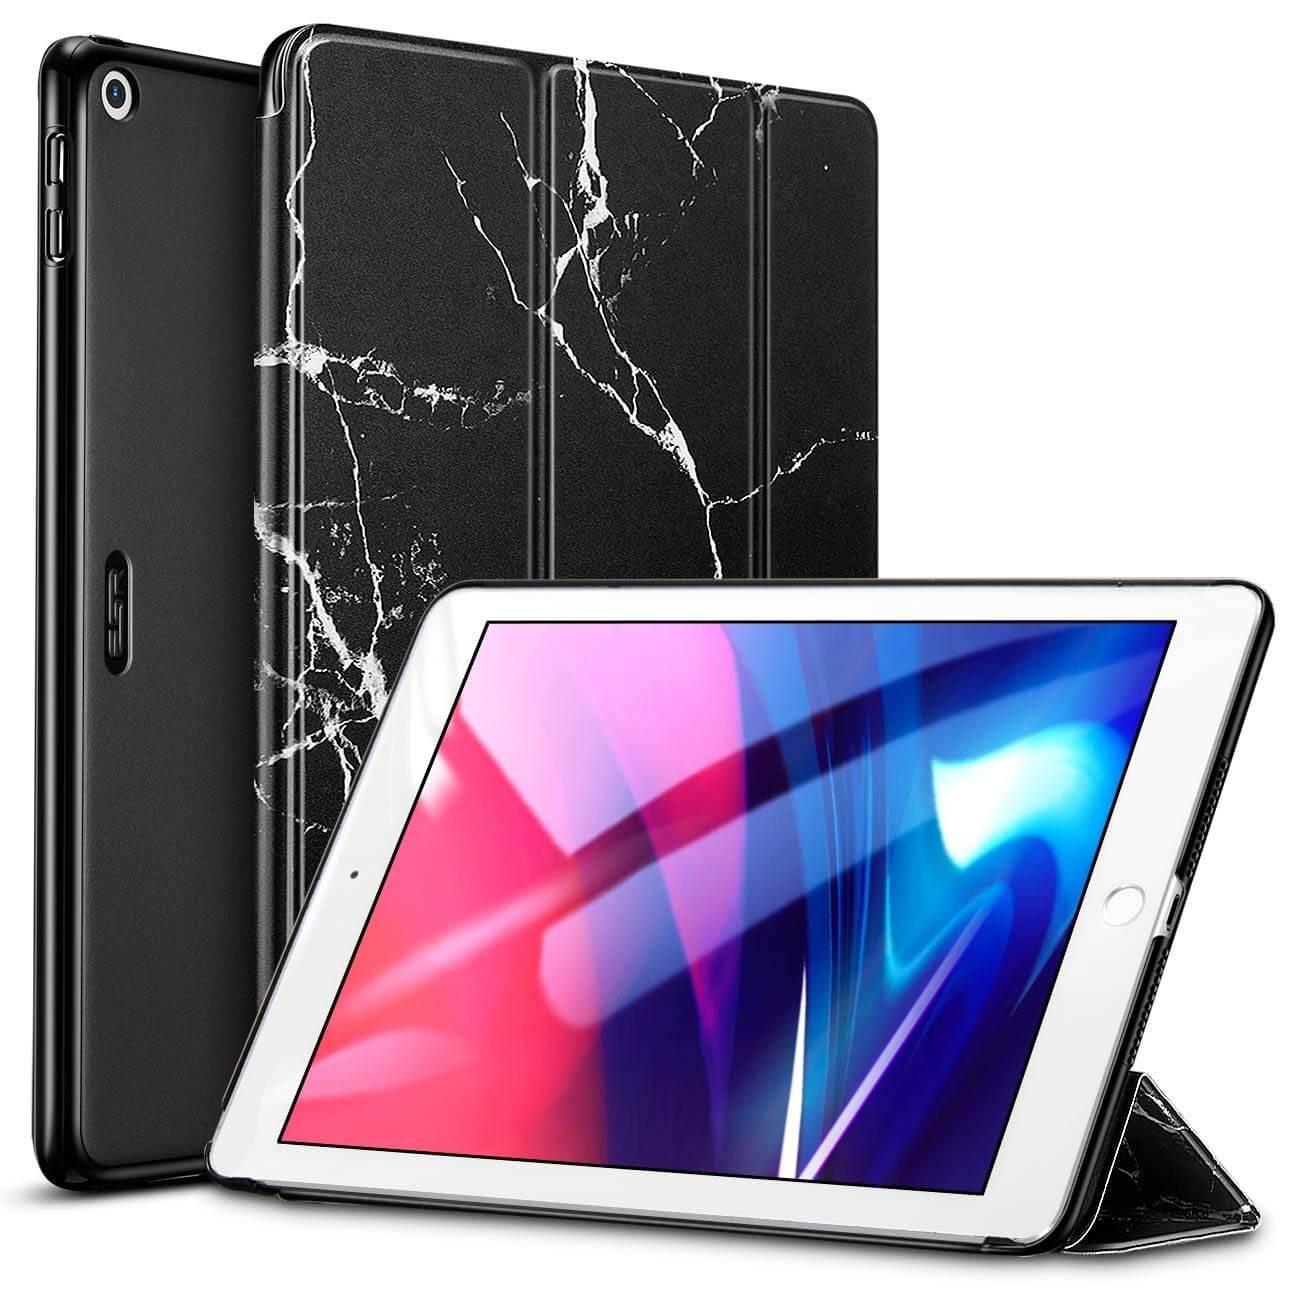 iPad 9.7 20182017 Marble Trifold Case black